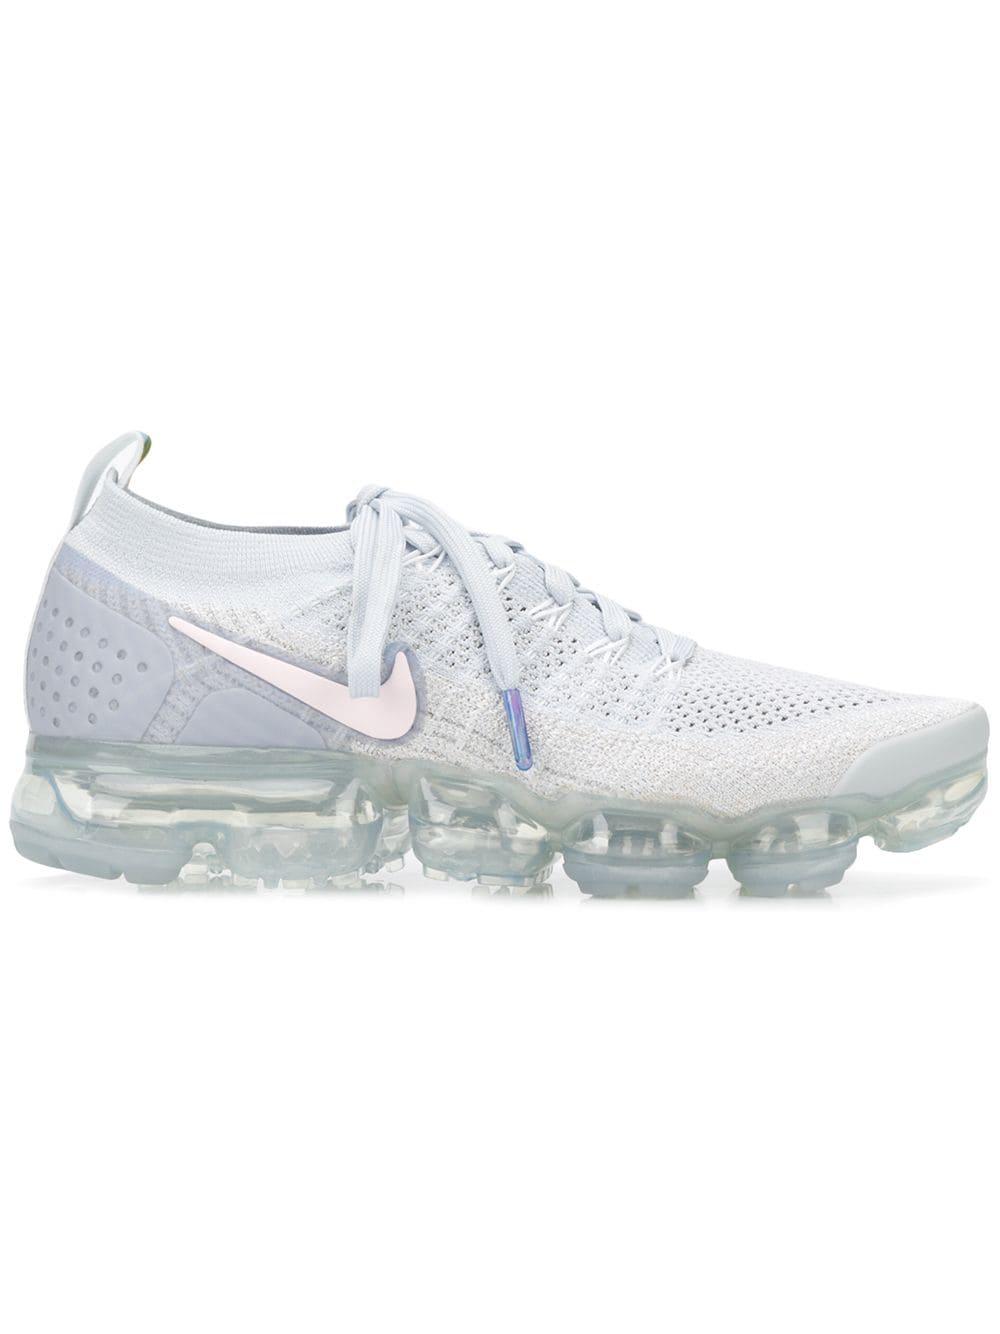 c7879252b4fe Nike Women s Air Vapormax Flyknit 2 Running Shoes